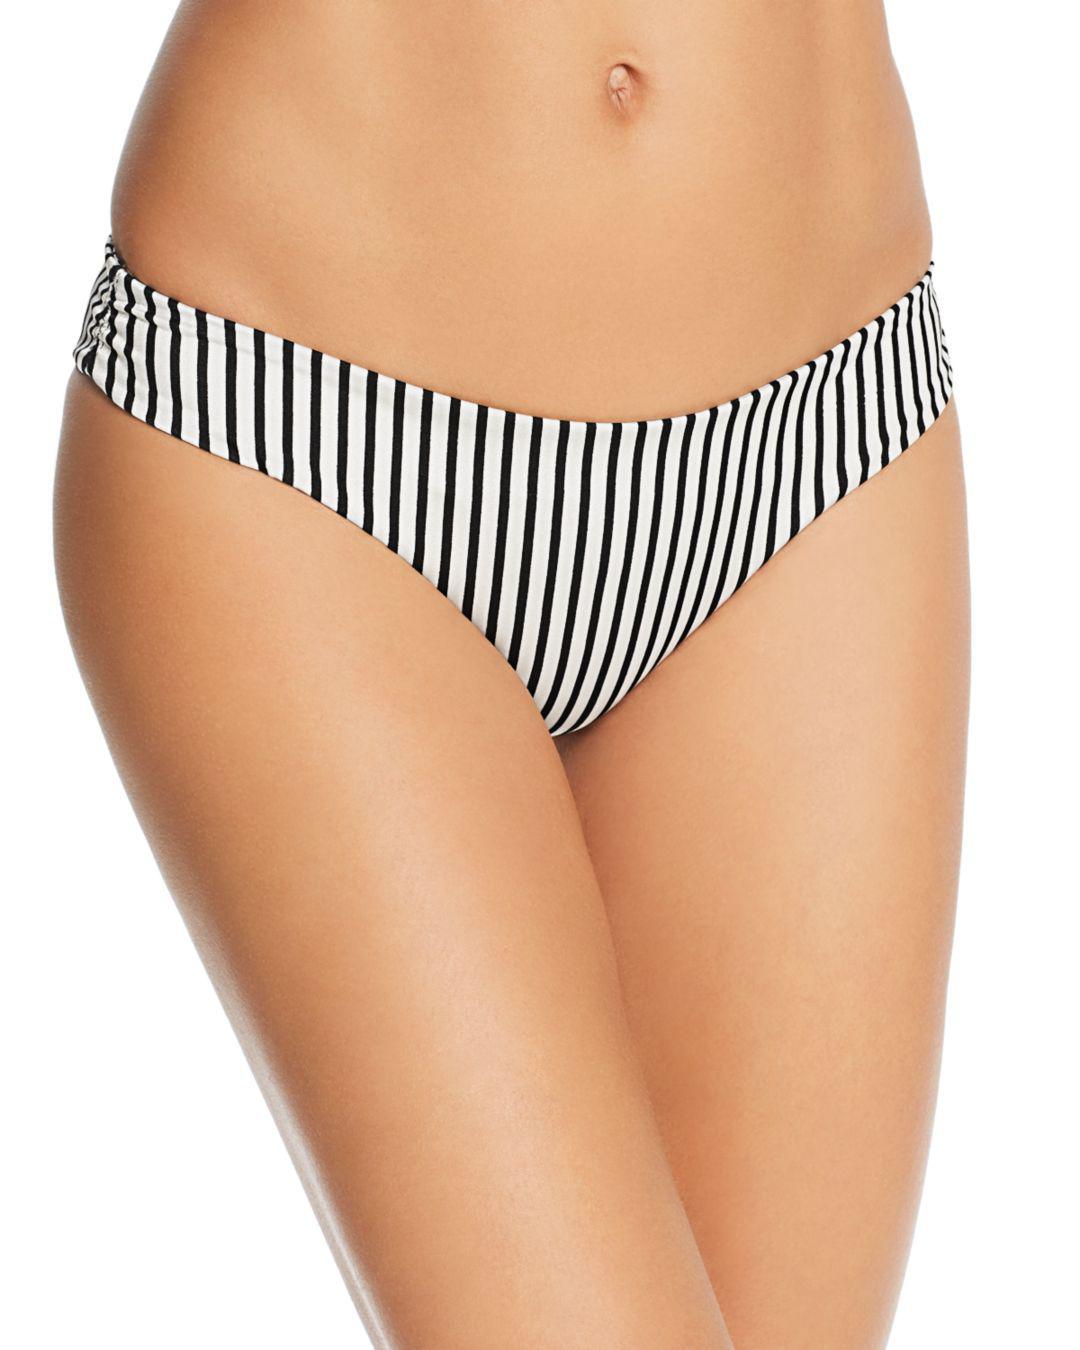 3827bf1c2 Lyst - Tori Praver Swimwear Caila Striped Bikini Bottom in Black